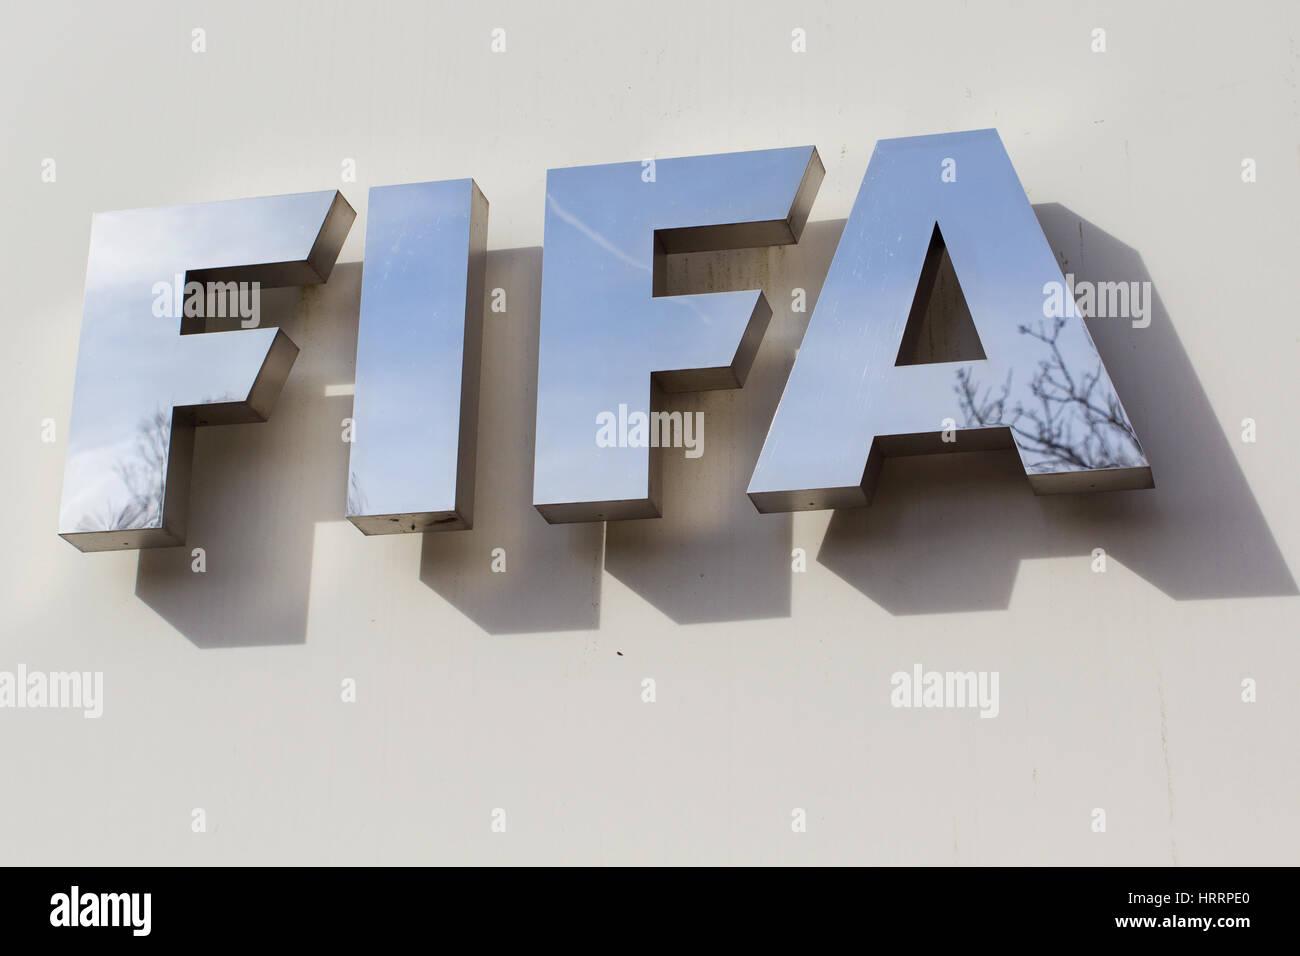 Fifa - Stock Image